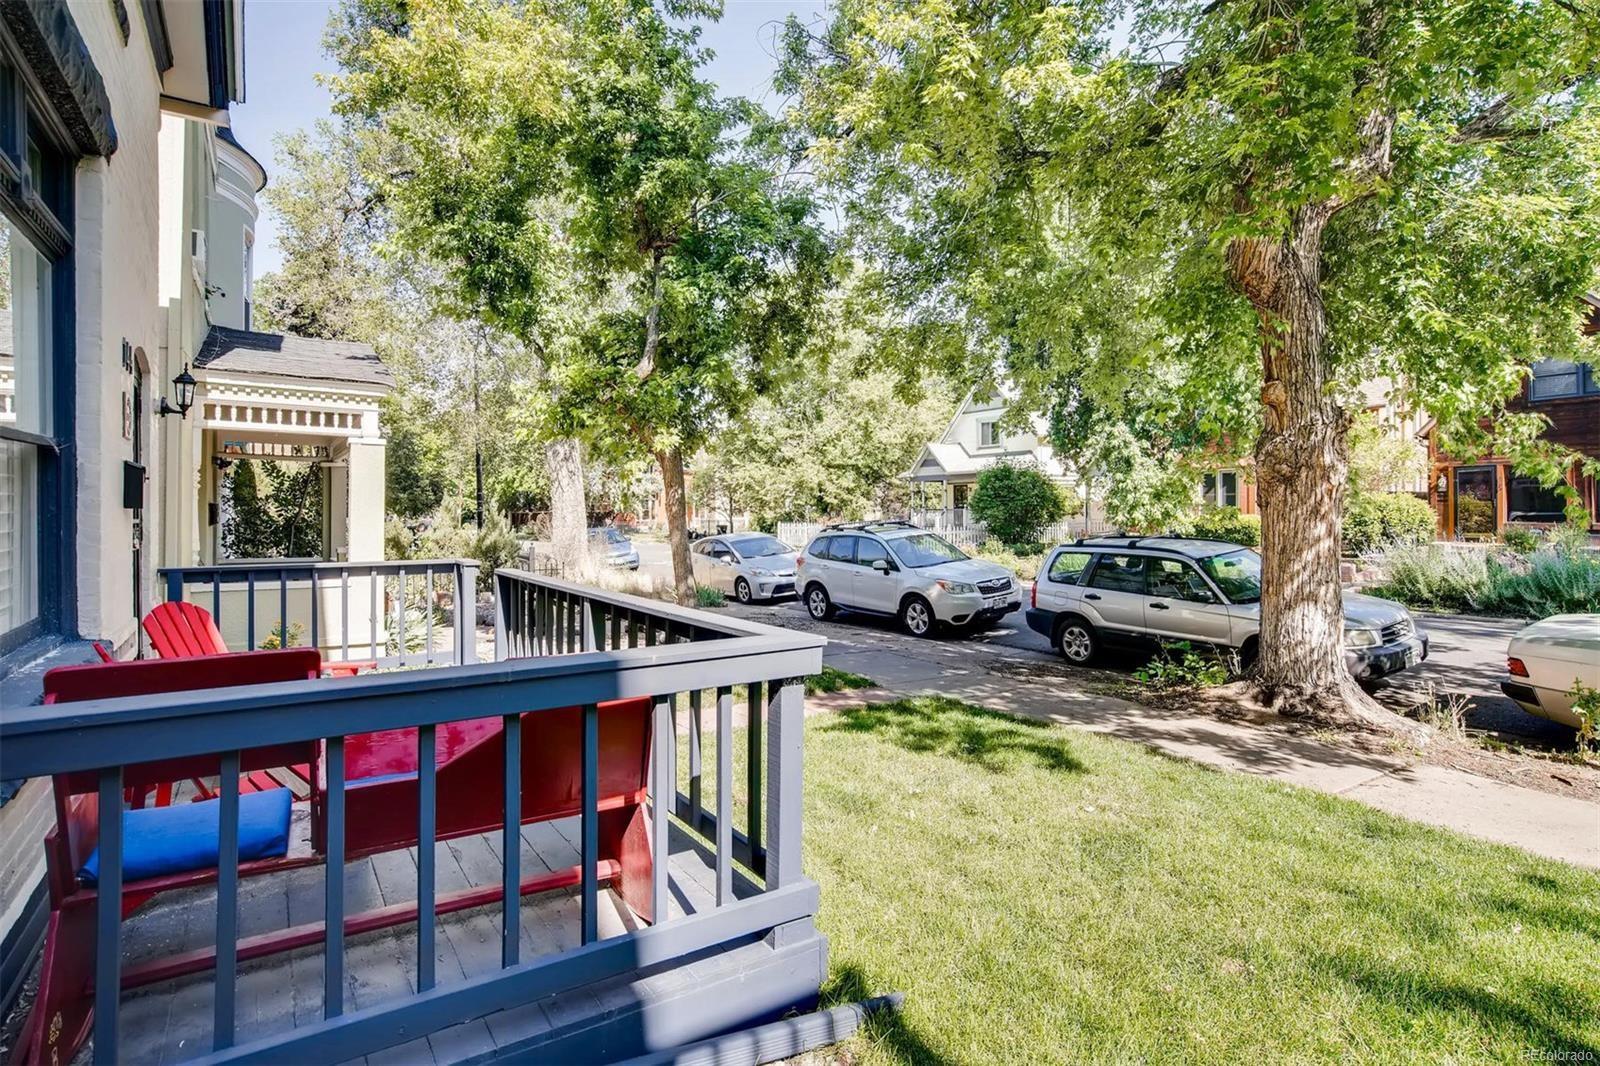 MLS# 1697462 - 3 - 144 W Ellsworth Avenue, Denver, CO 80223